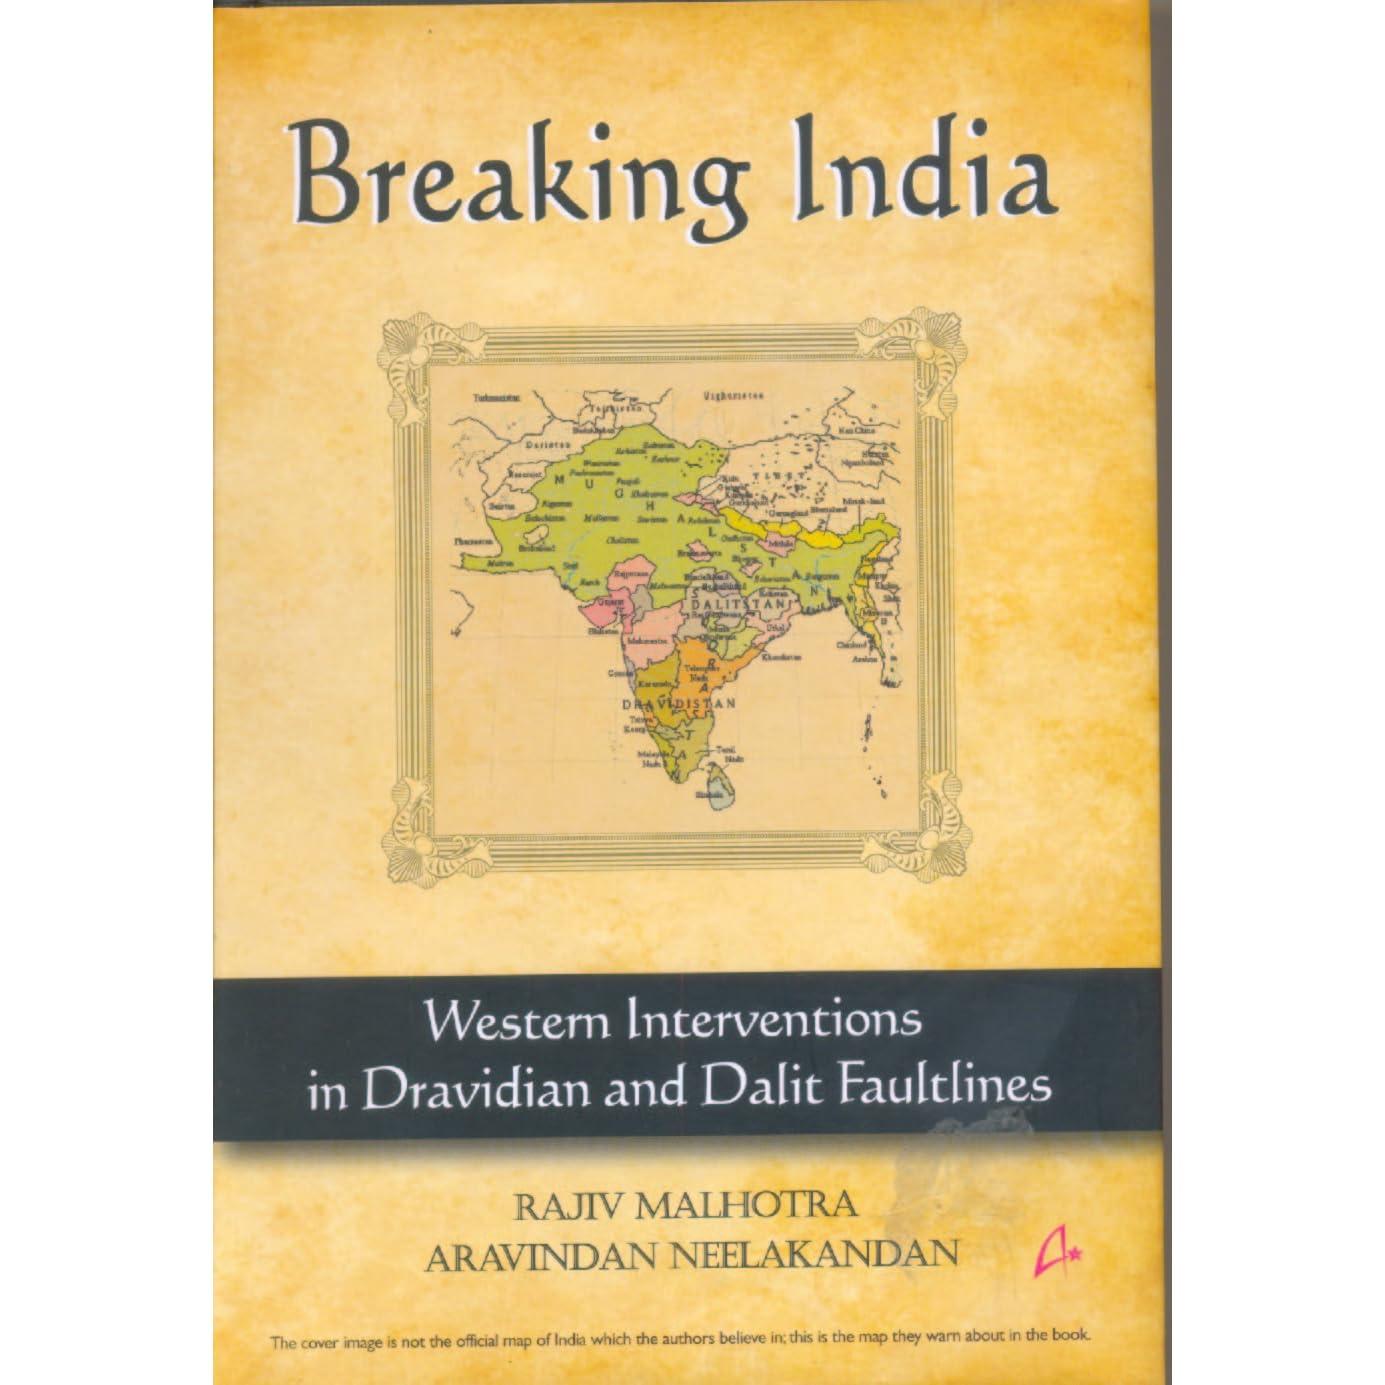 Breaking india goodreads giveaways